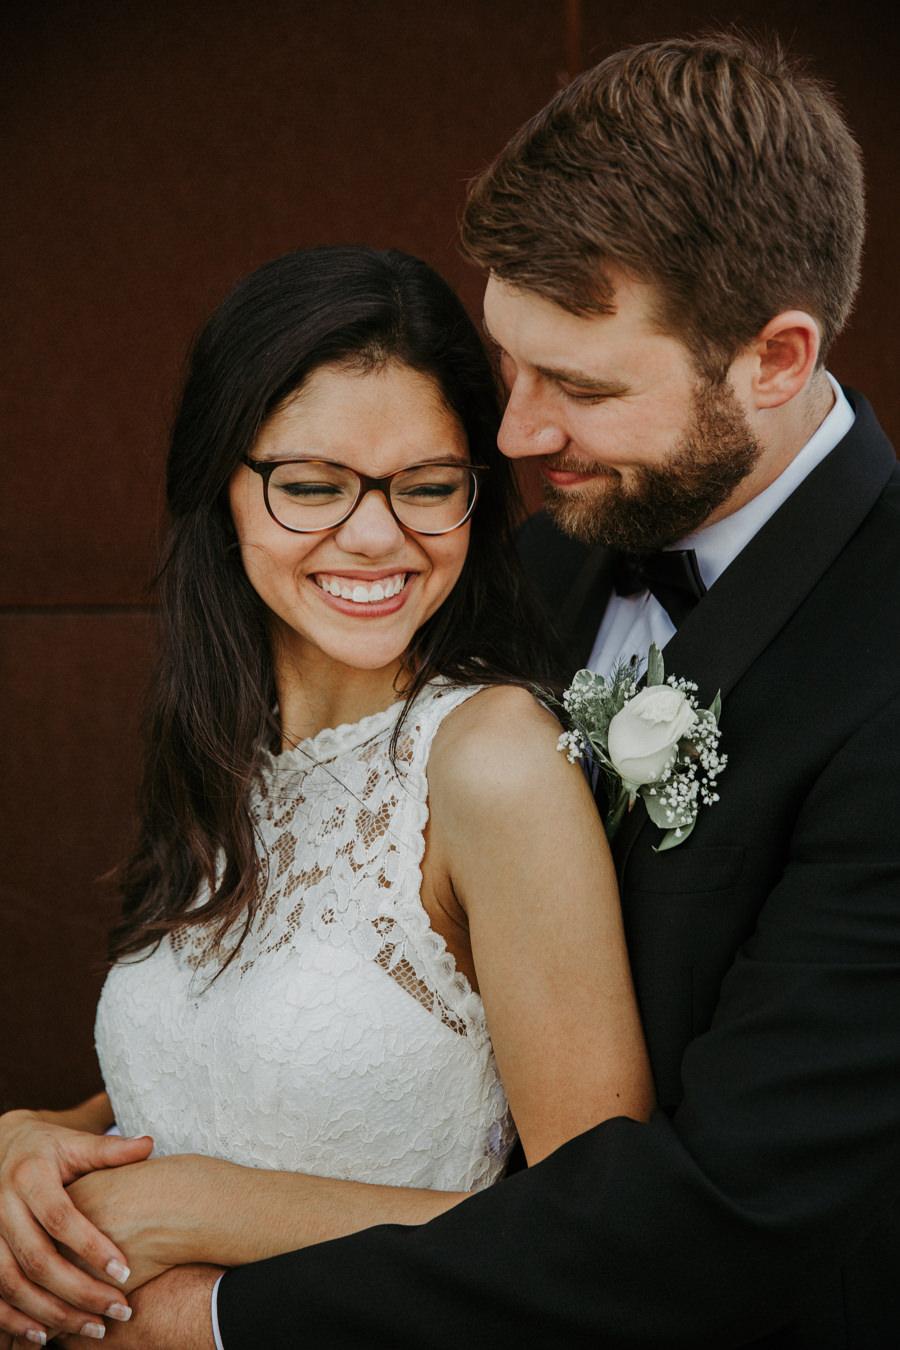 Tampa Heights Industrial Wedding at Cavu Emmy RJ-108.jpg